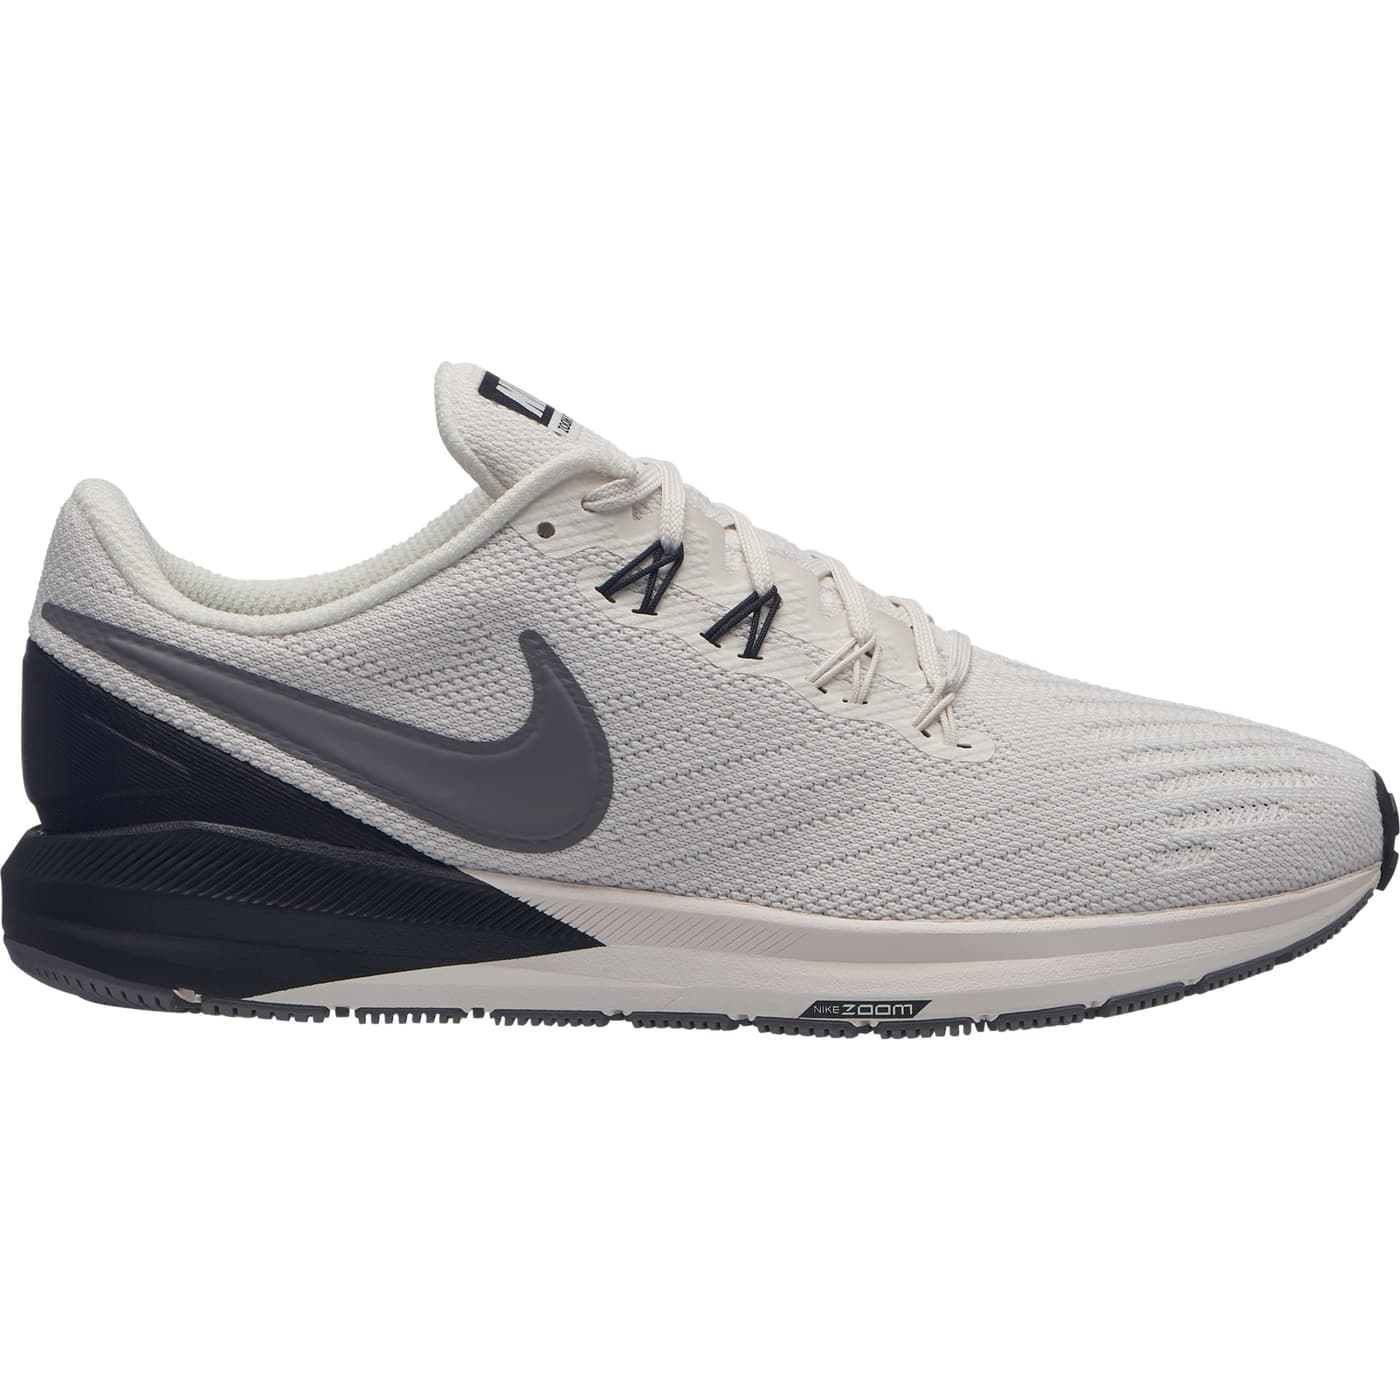 Nike Air Zoom Structure 22 Scarpa da donna running